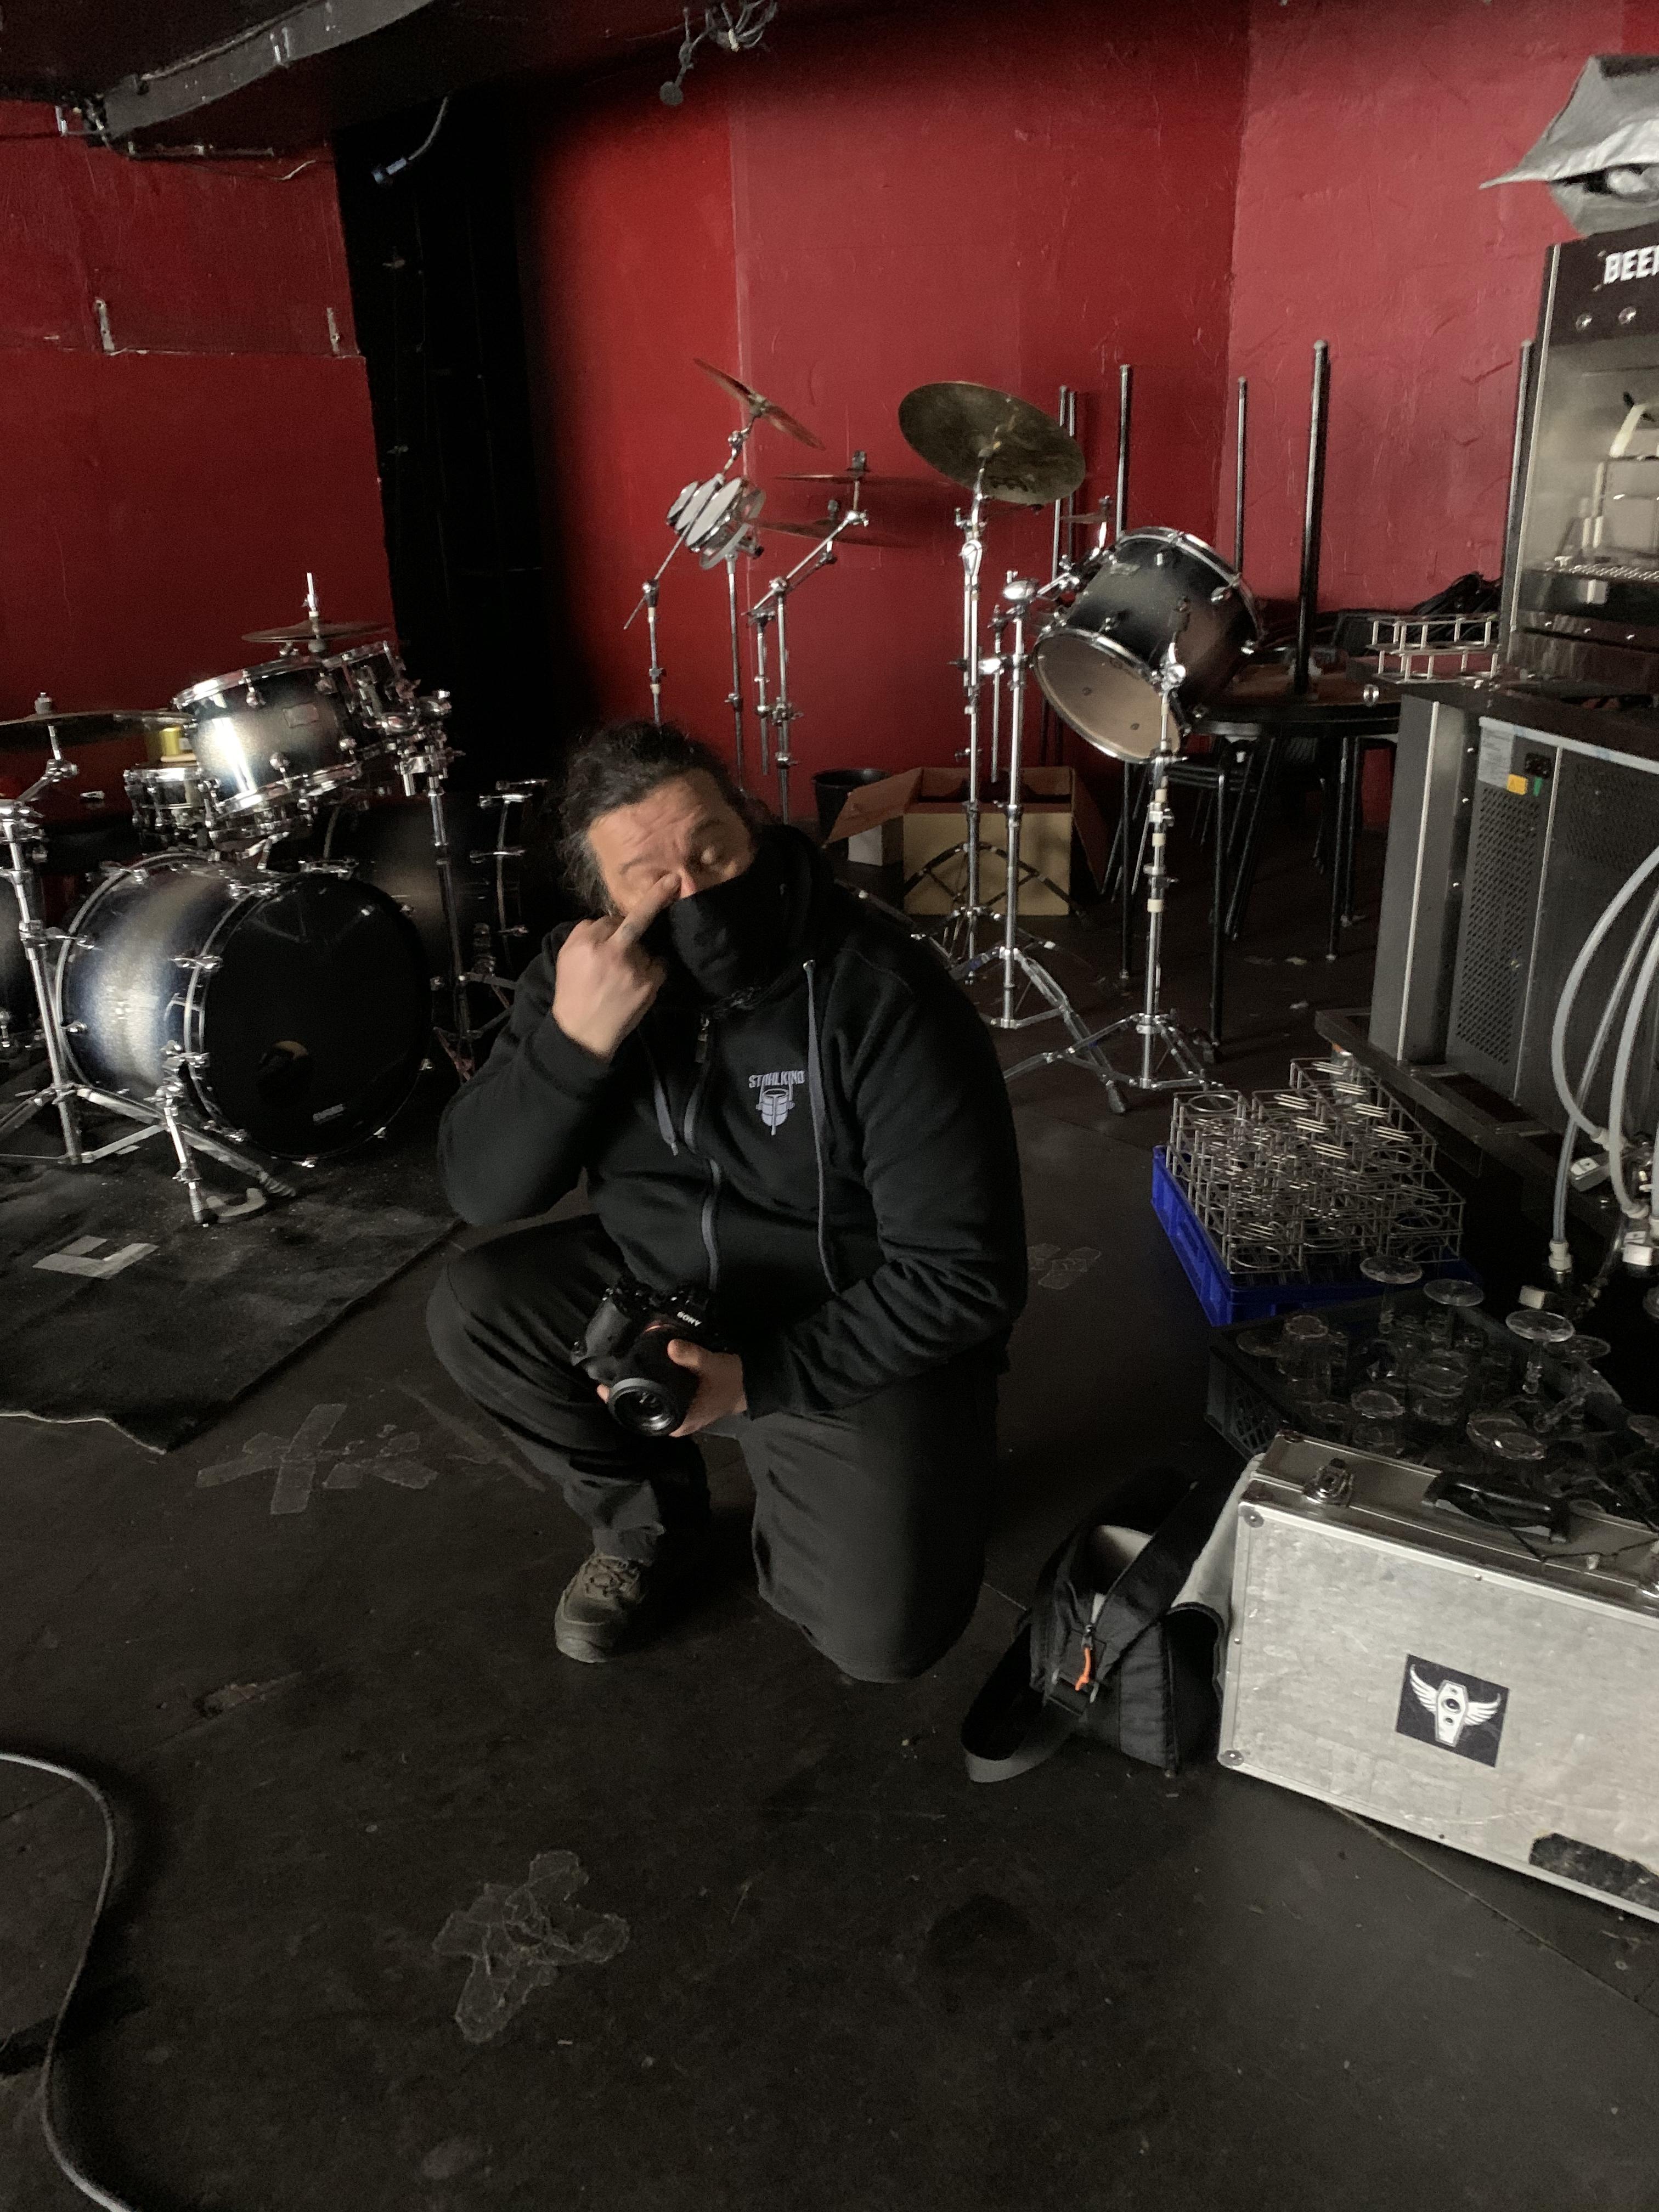 The-Very-End-Metal-Video-Shoot-behind-the-scenes_5444